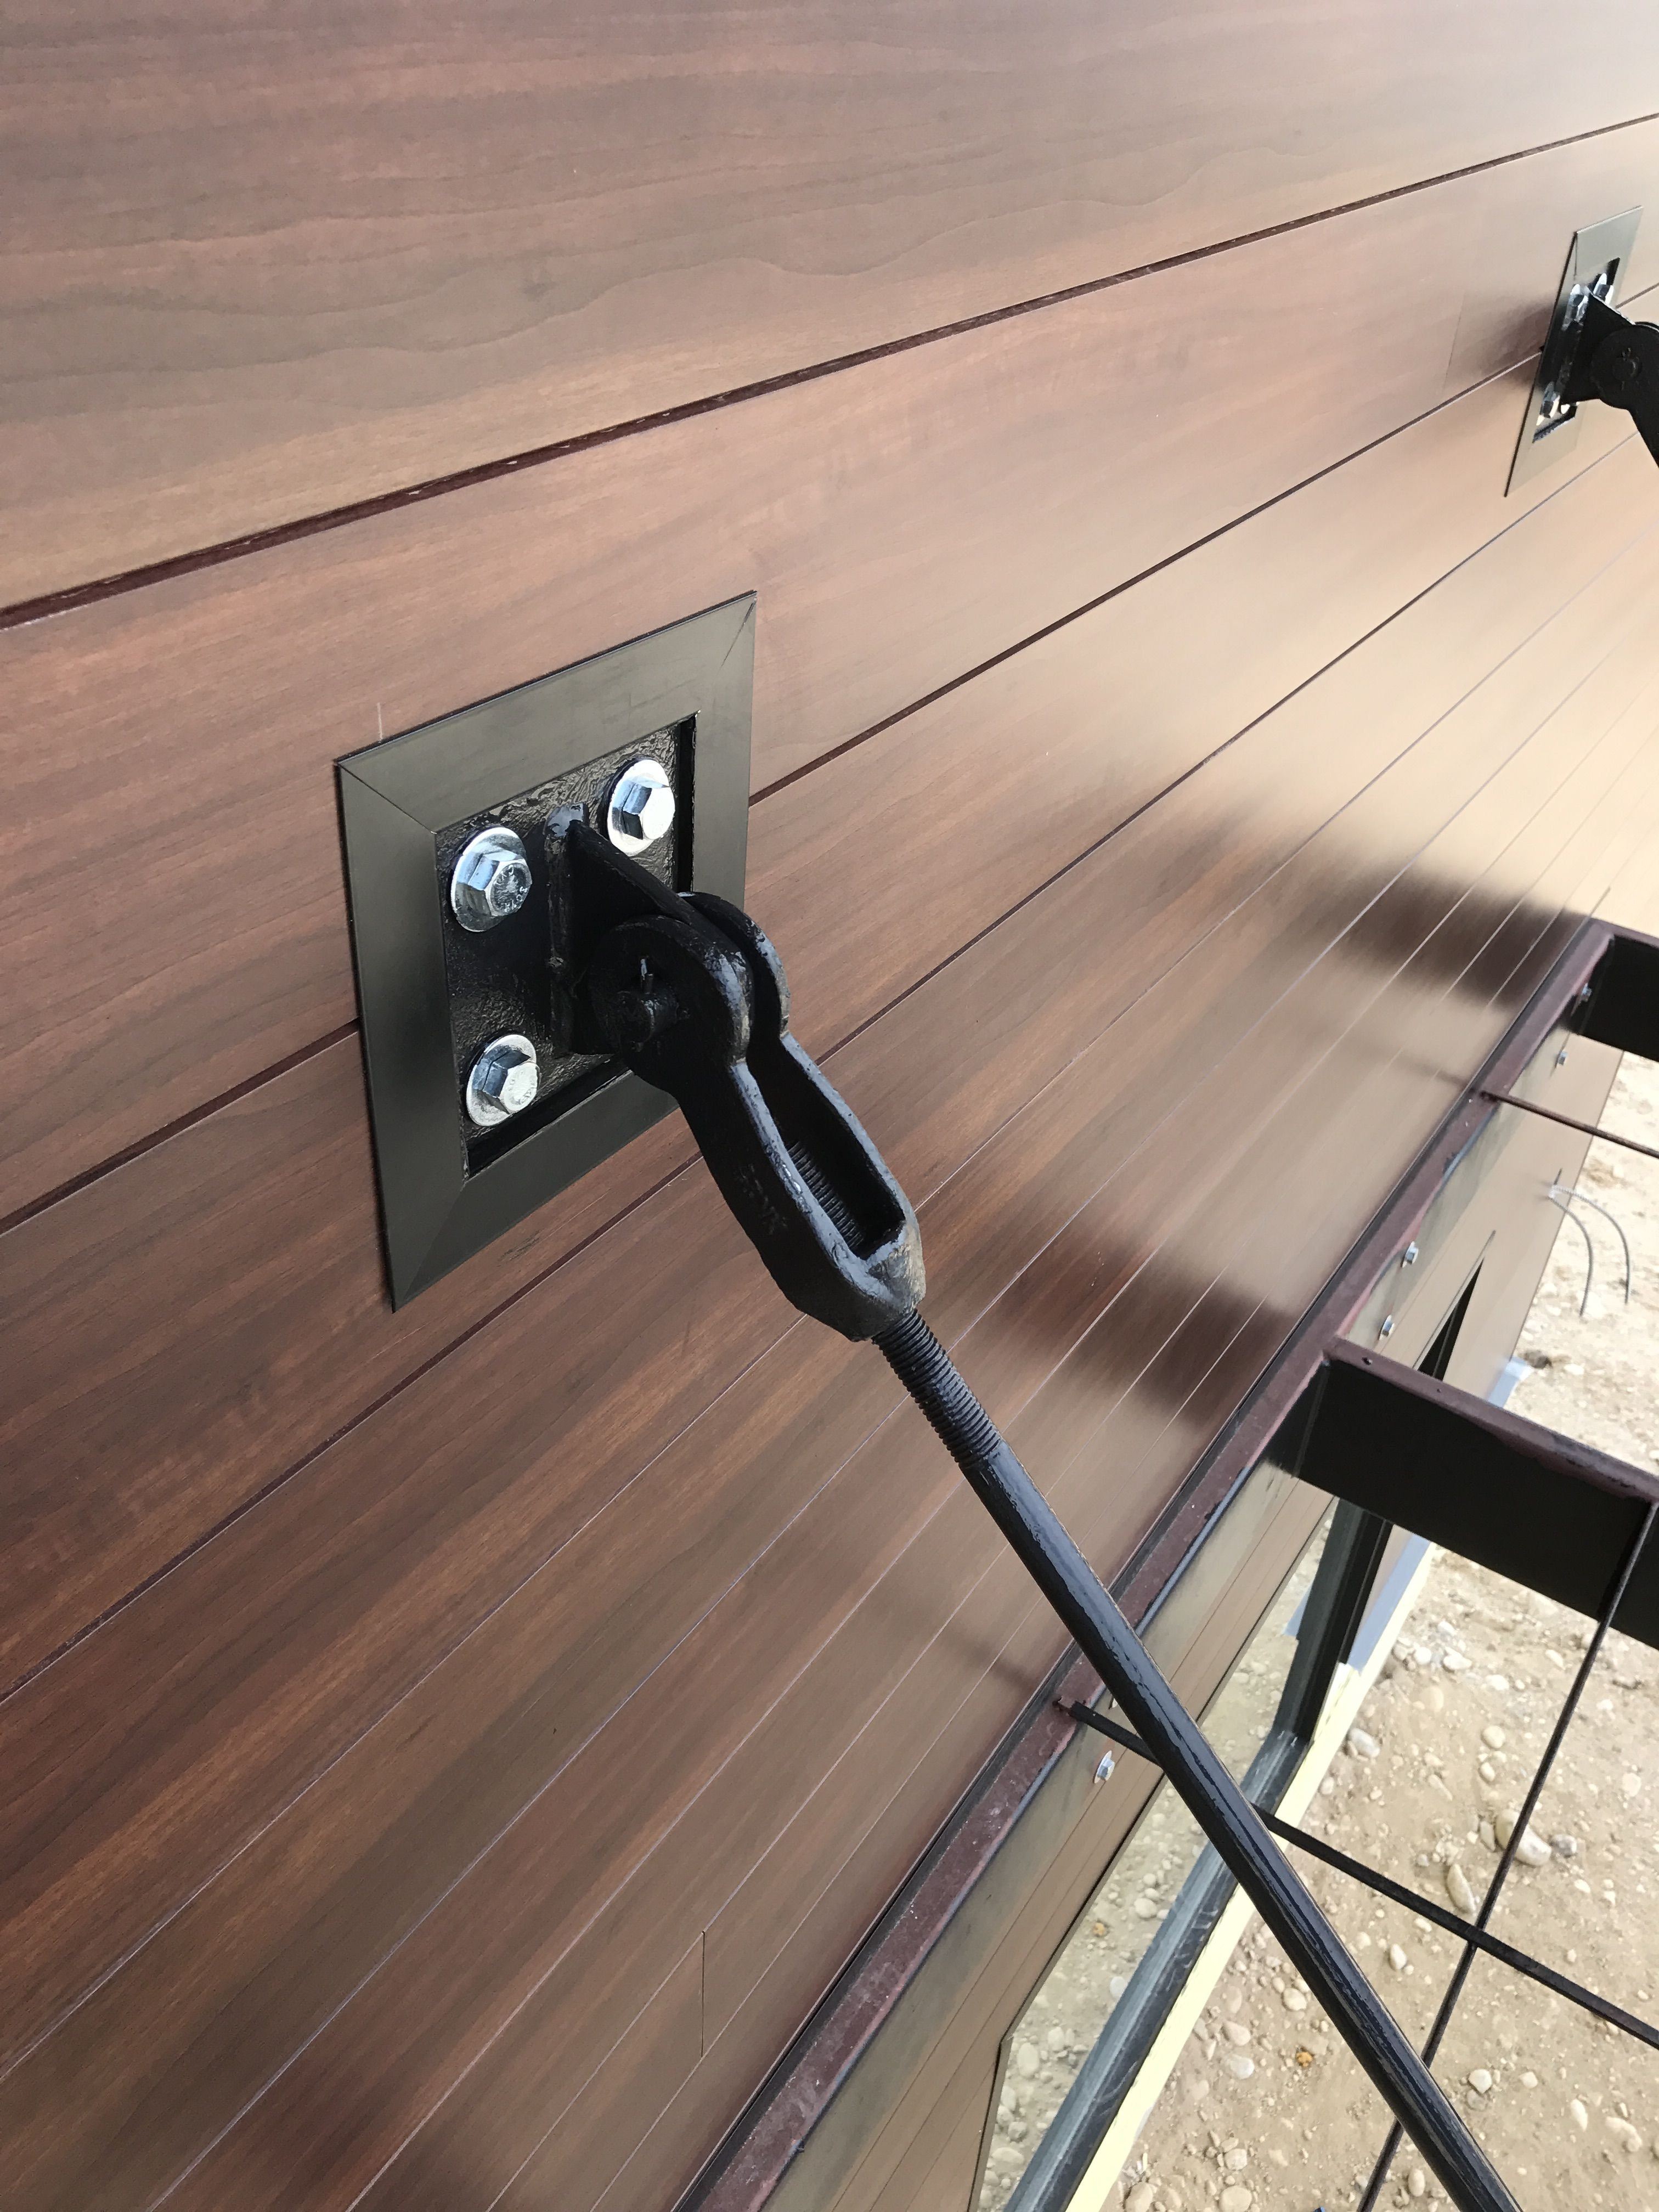 Steel Wall Anchor Bolts And Aluminum Siding That Looks Like Wood Aluminum Siding Steel Wall Wall Anchors